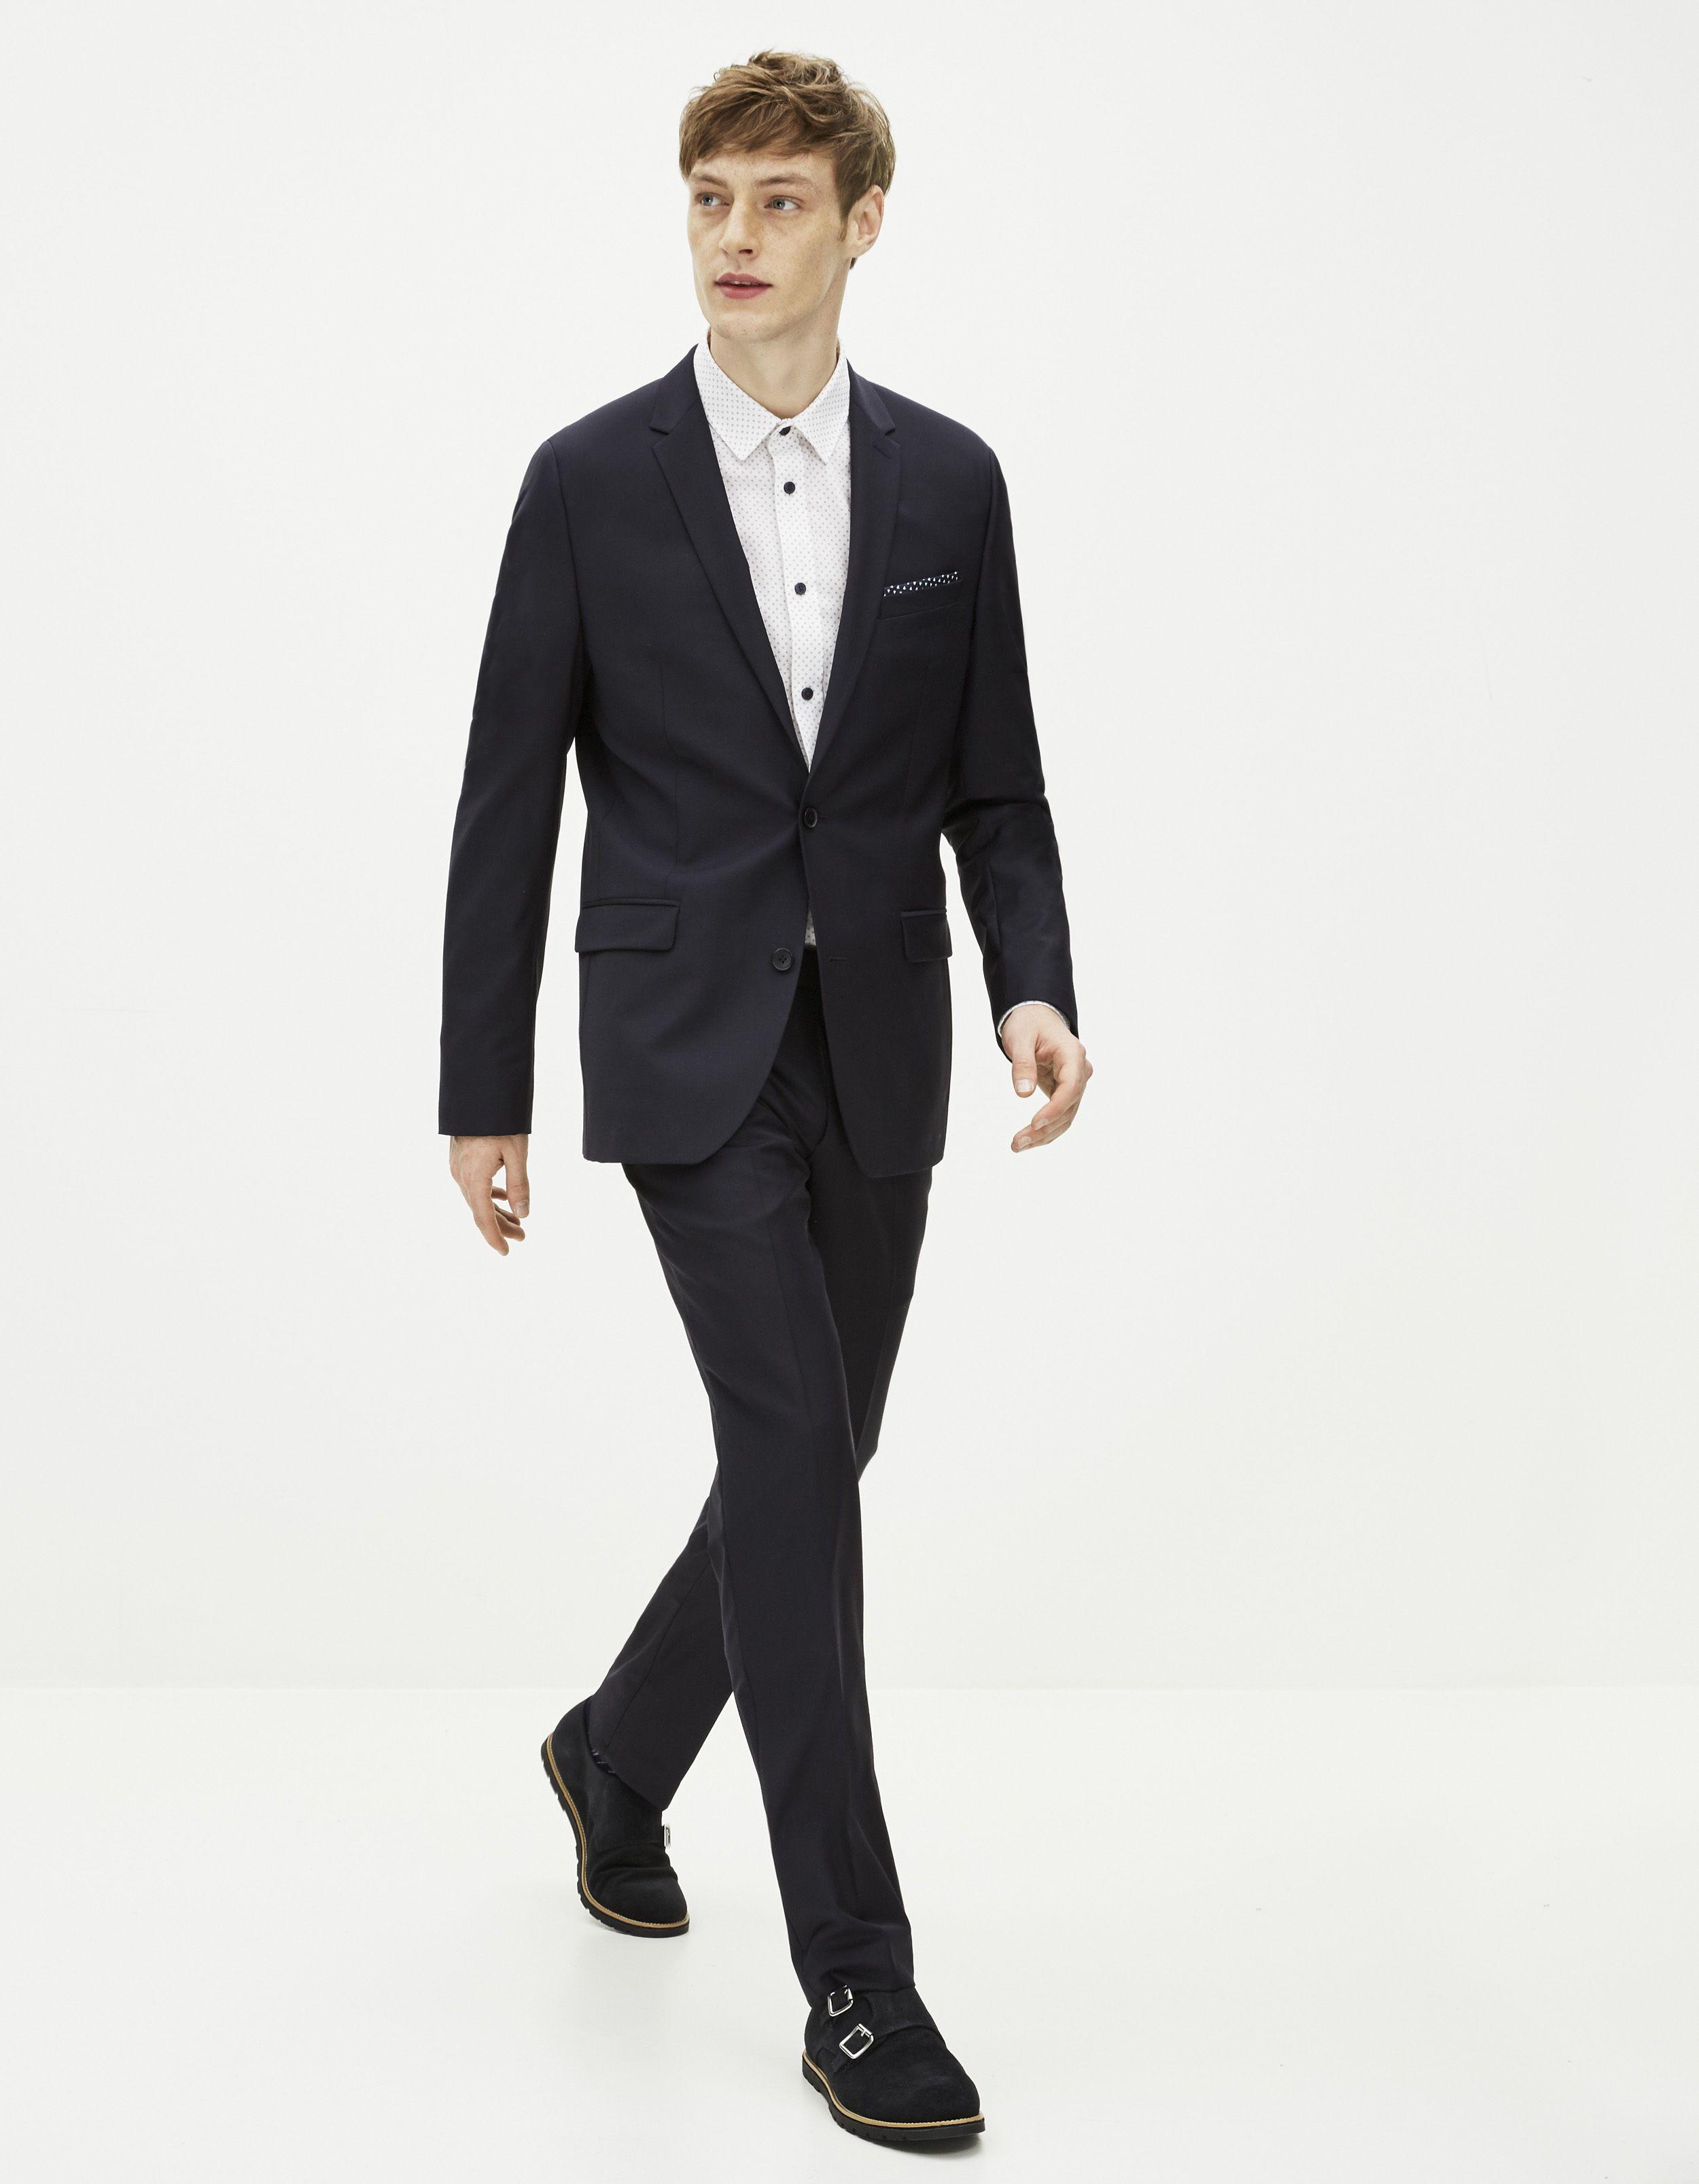 Veste costume laine et stretch - FCUPLANE - Celio France